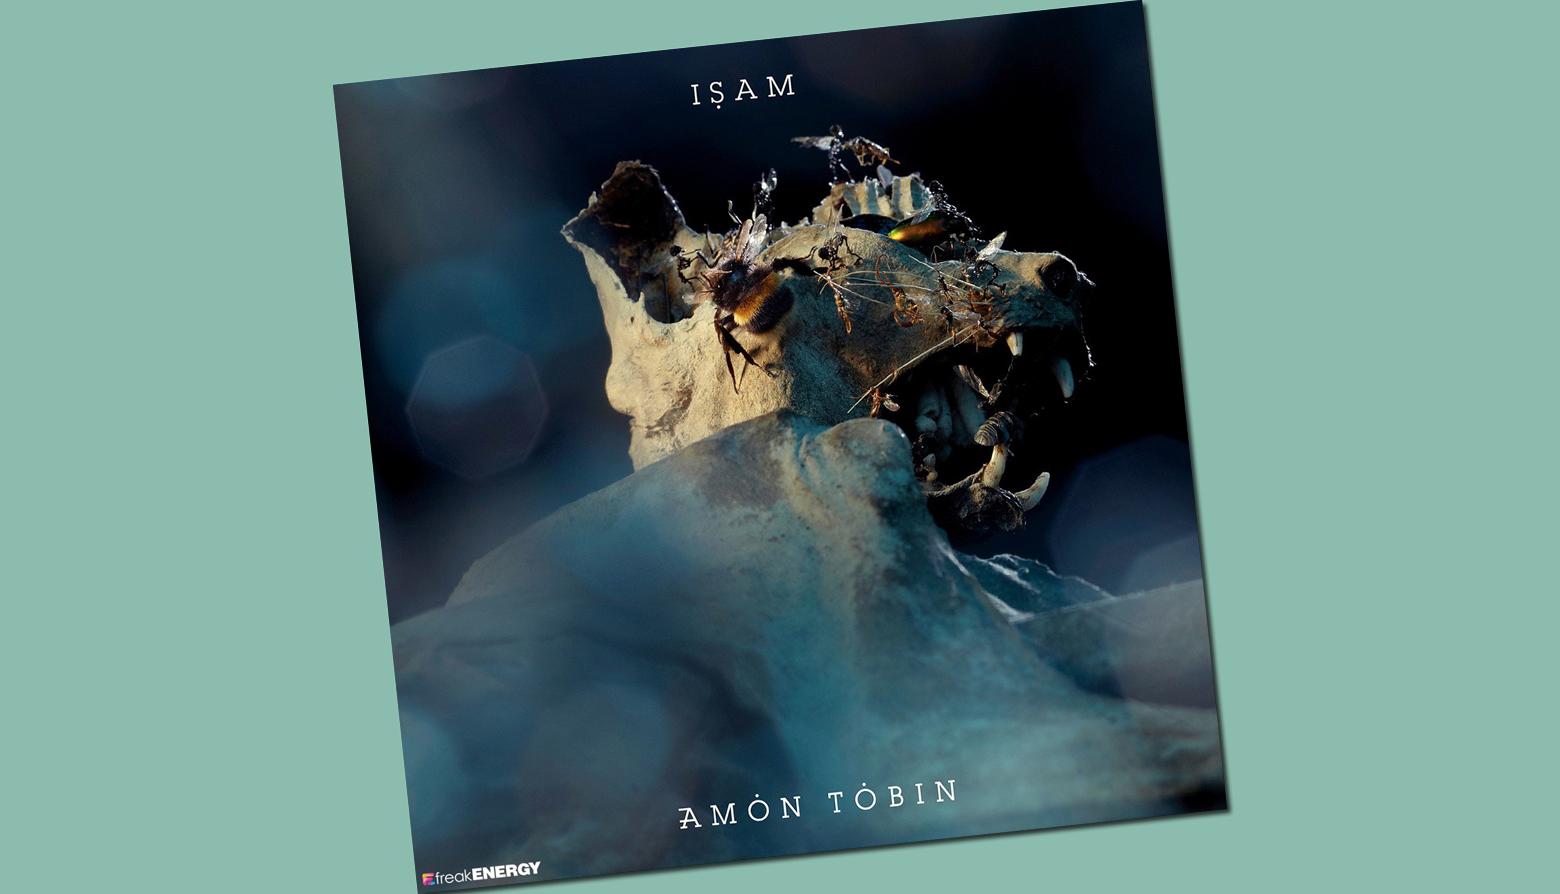 1302752418_amon-tobin-isam-2011